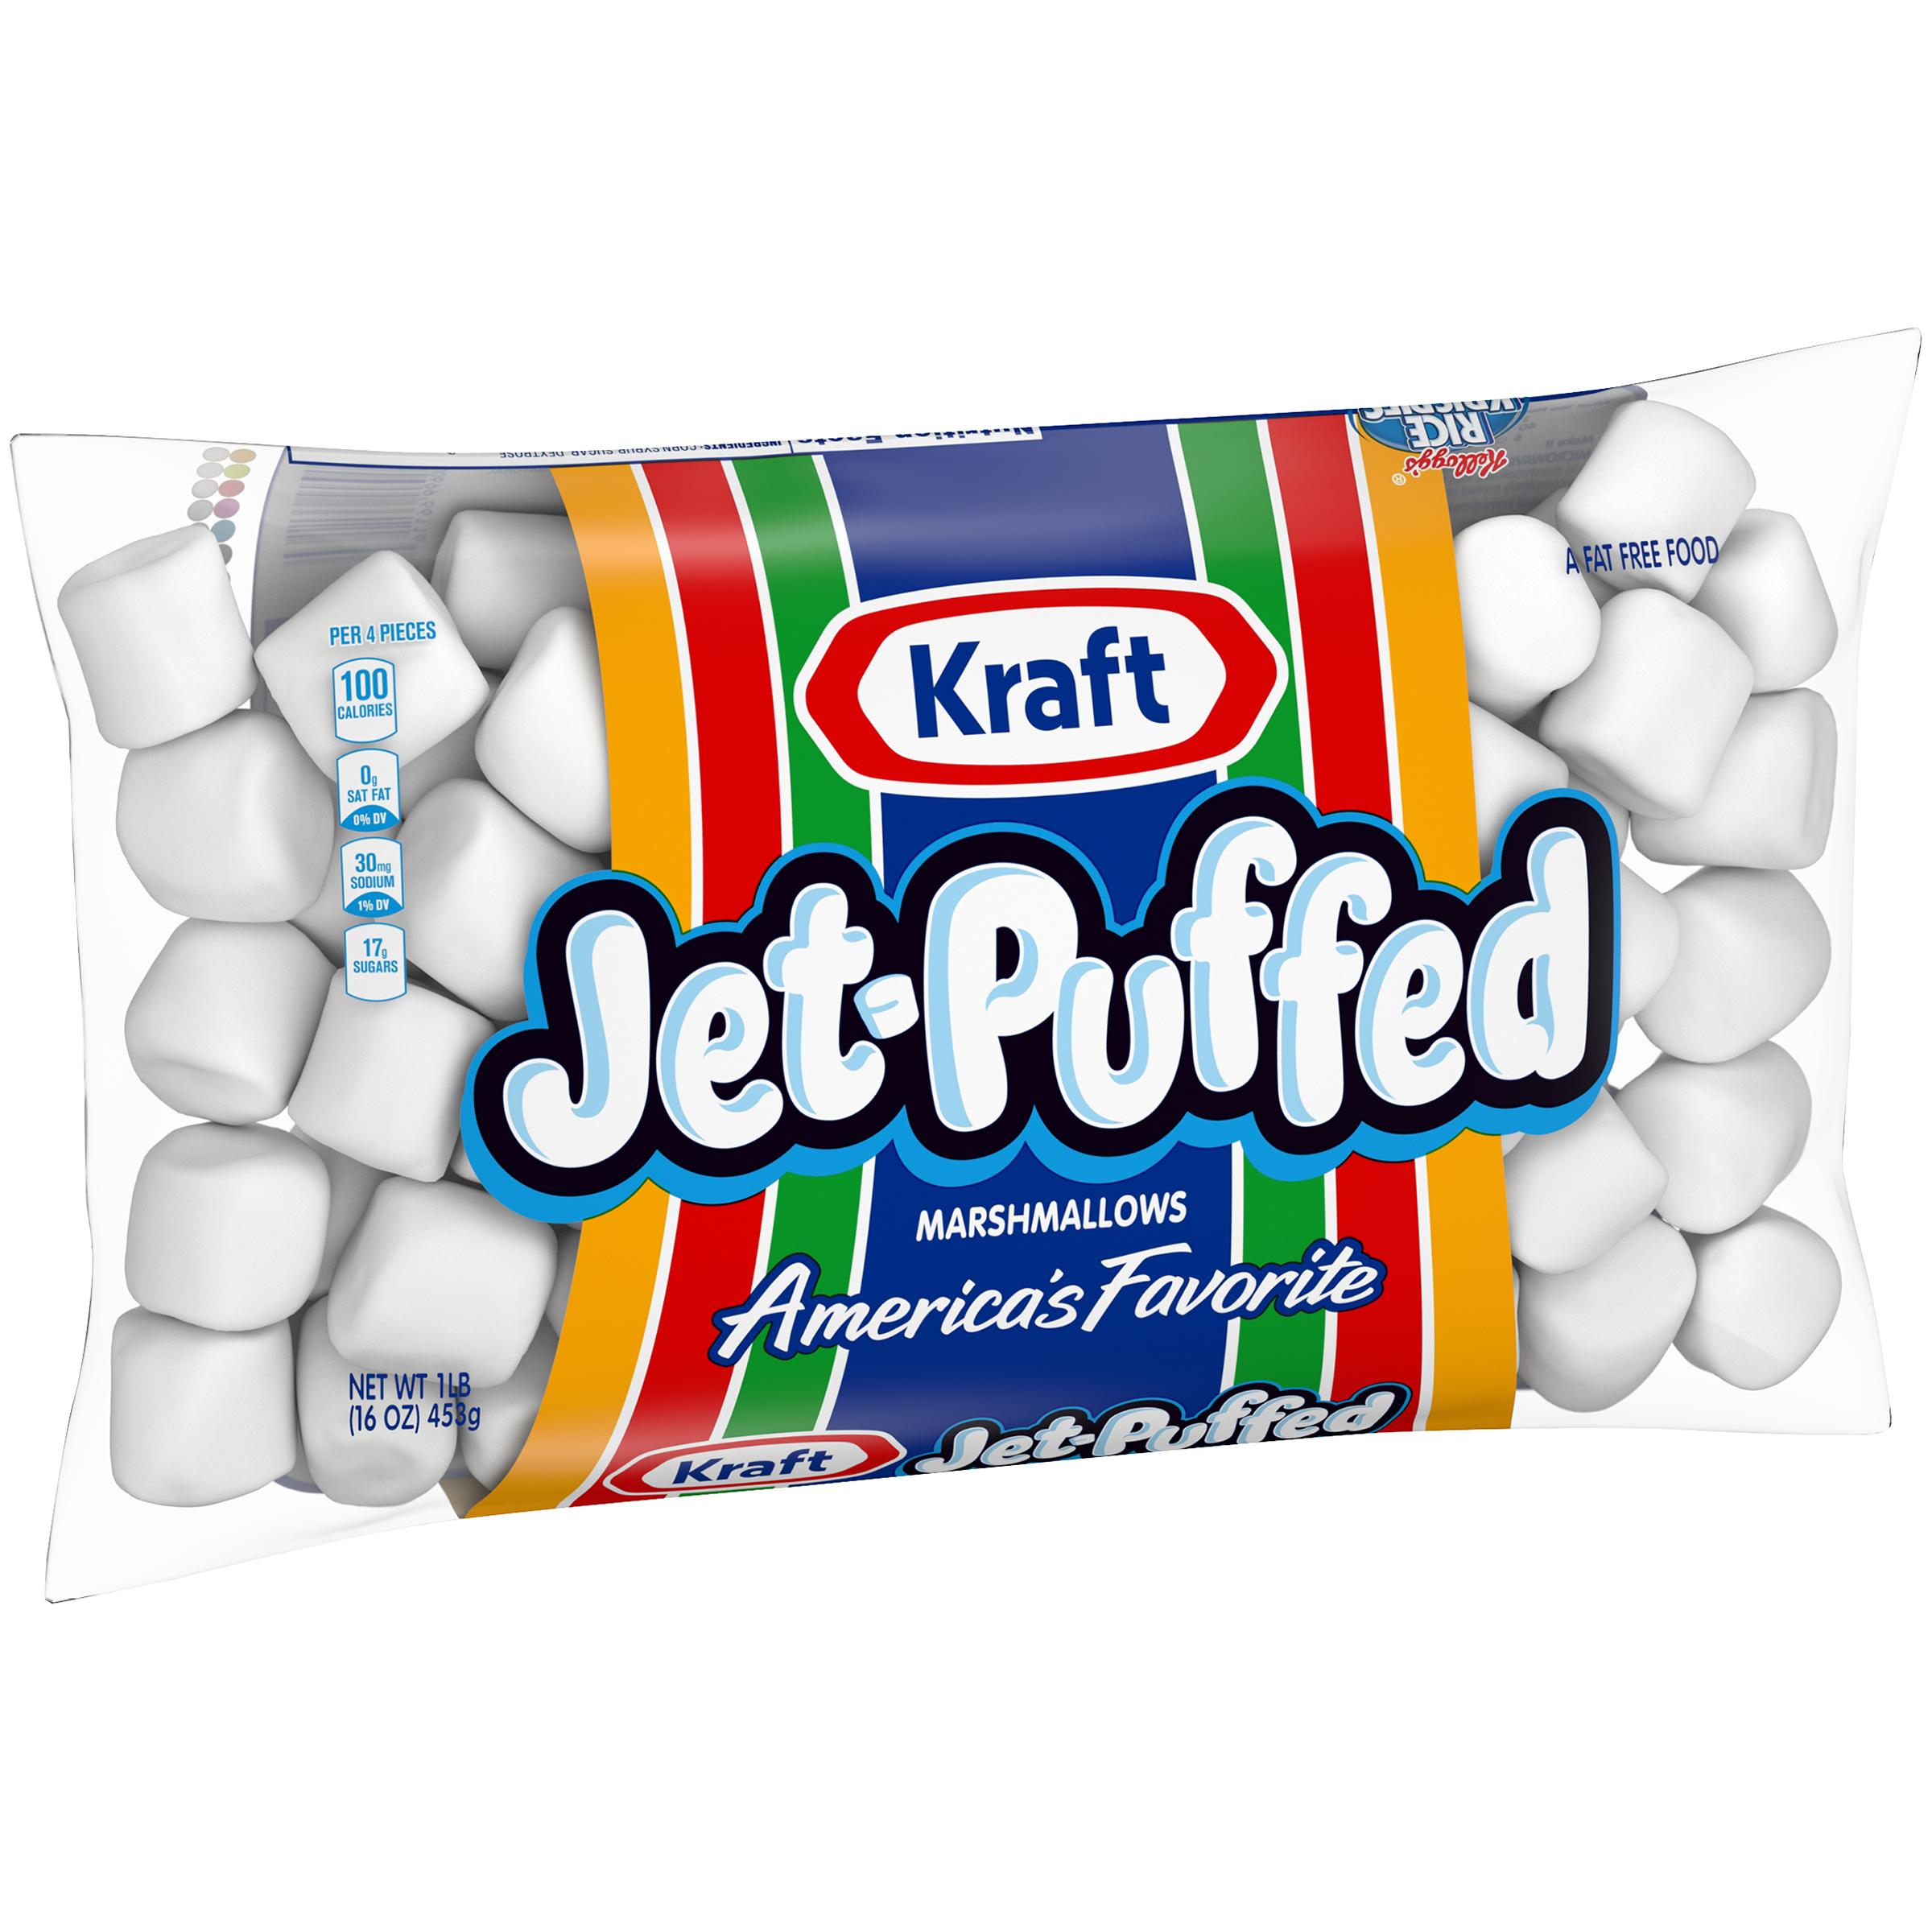 (4 Pack) Jet-Puffed Marshmallows, 16 oz Bag